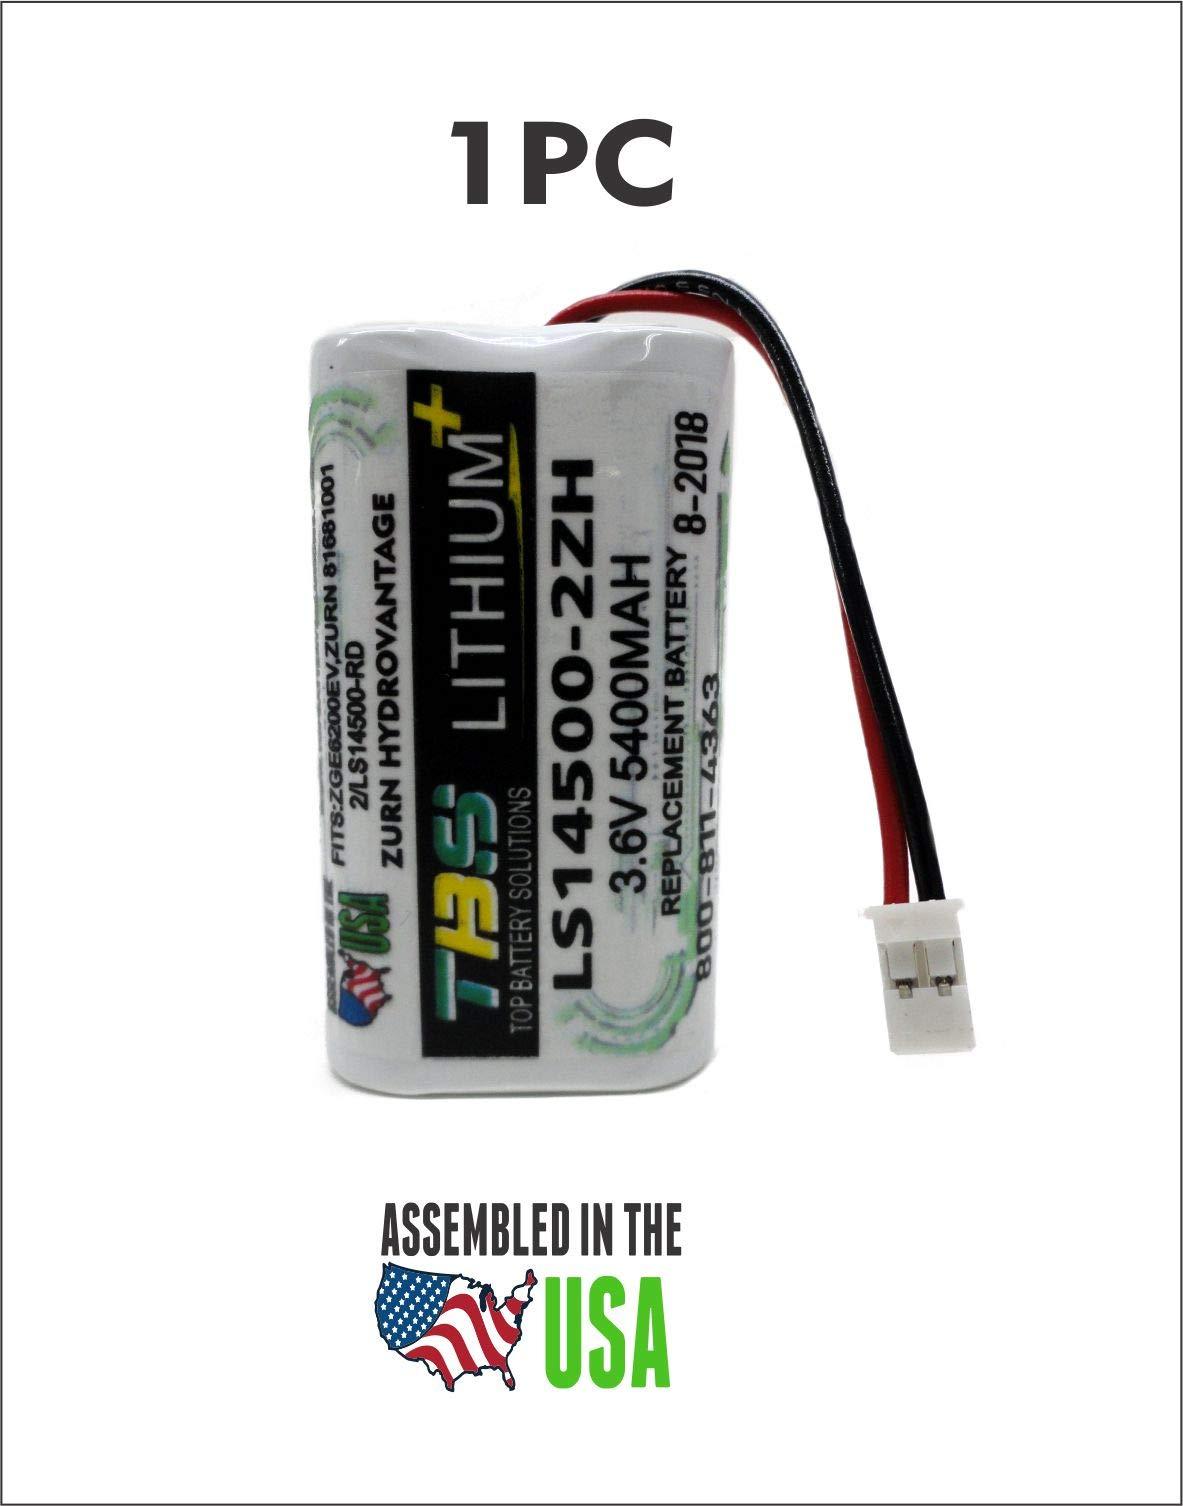 Zurn HydroVantage ZGEN6200EV Battery - LS14500-2ZH / 81681001/2/LS14500-RD REPLACEMENT BATTERY